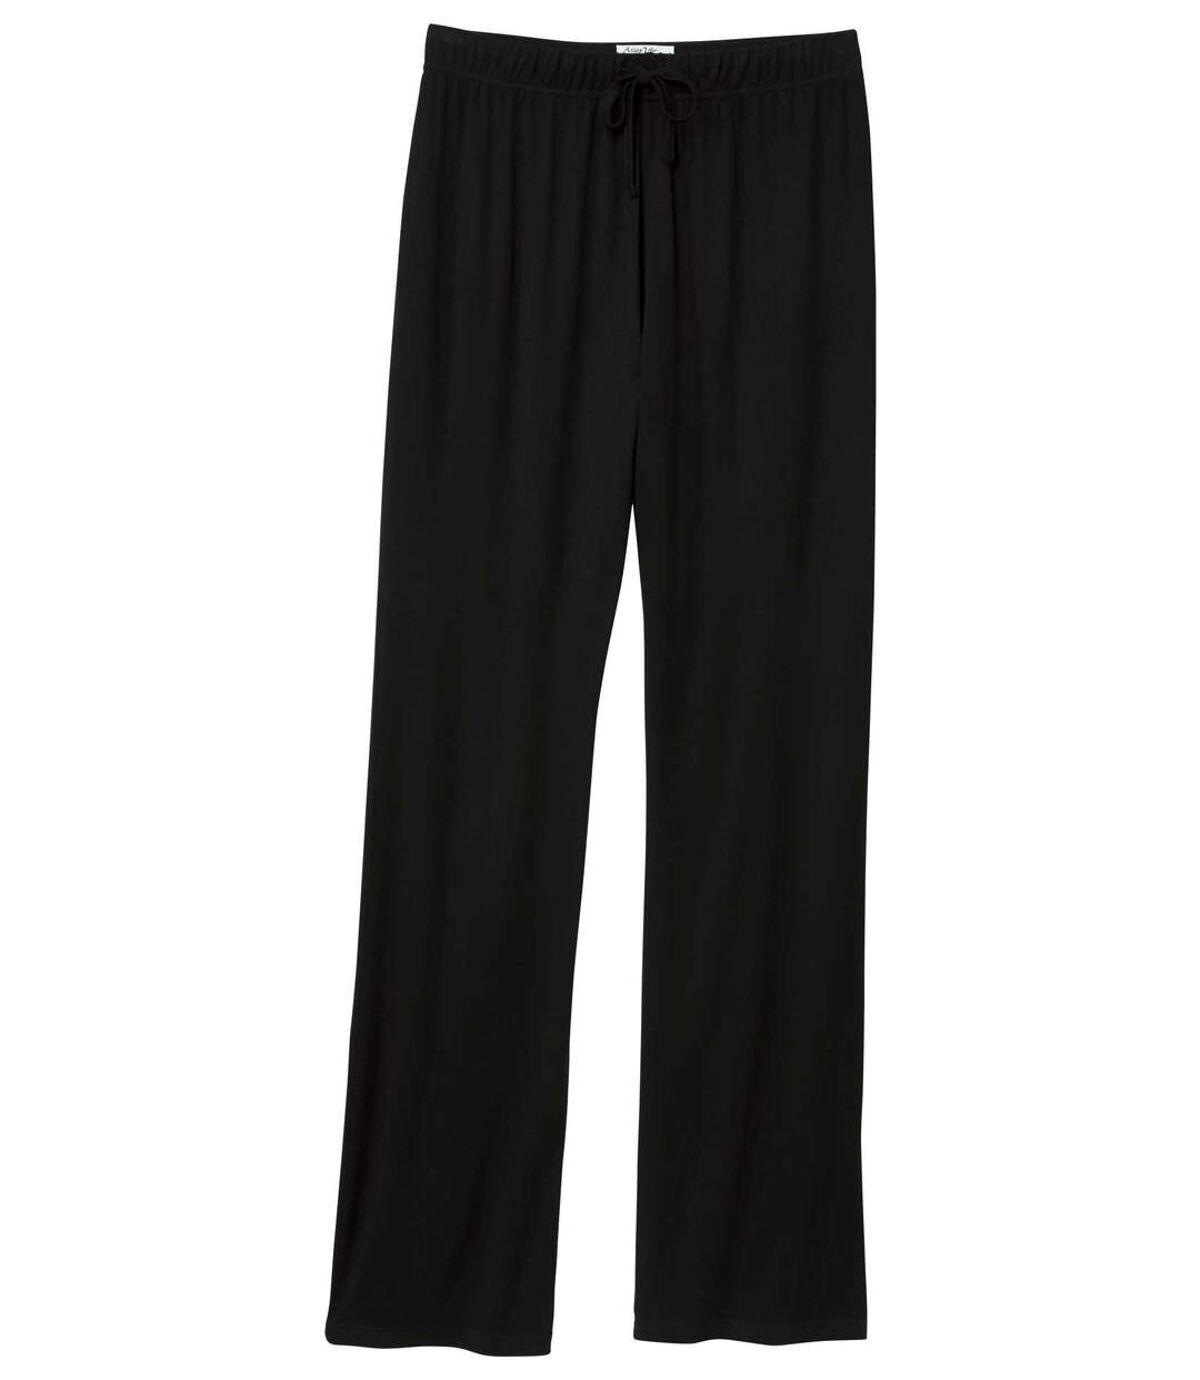 Women's Black Loose Fit Pants Atlas For Men